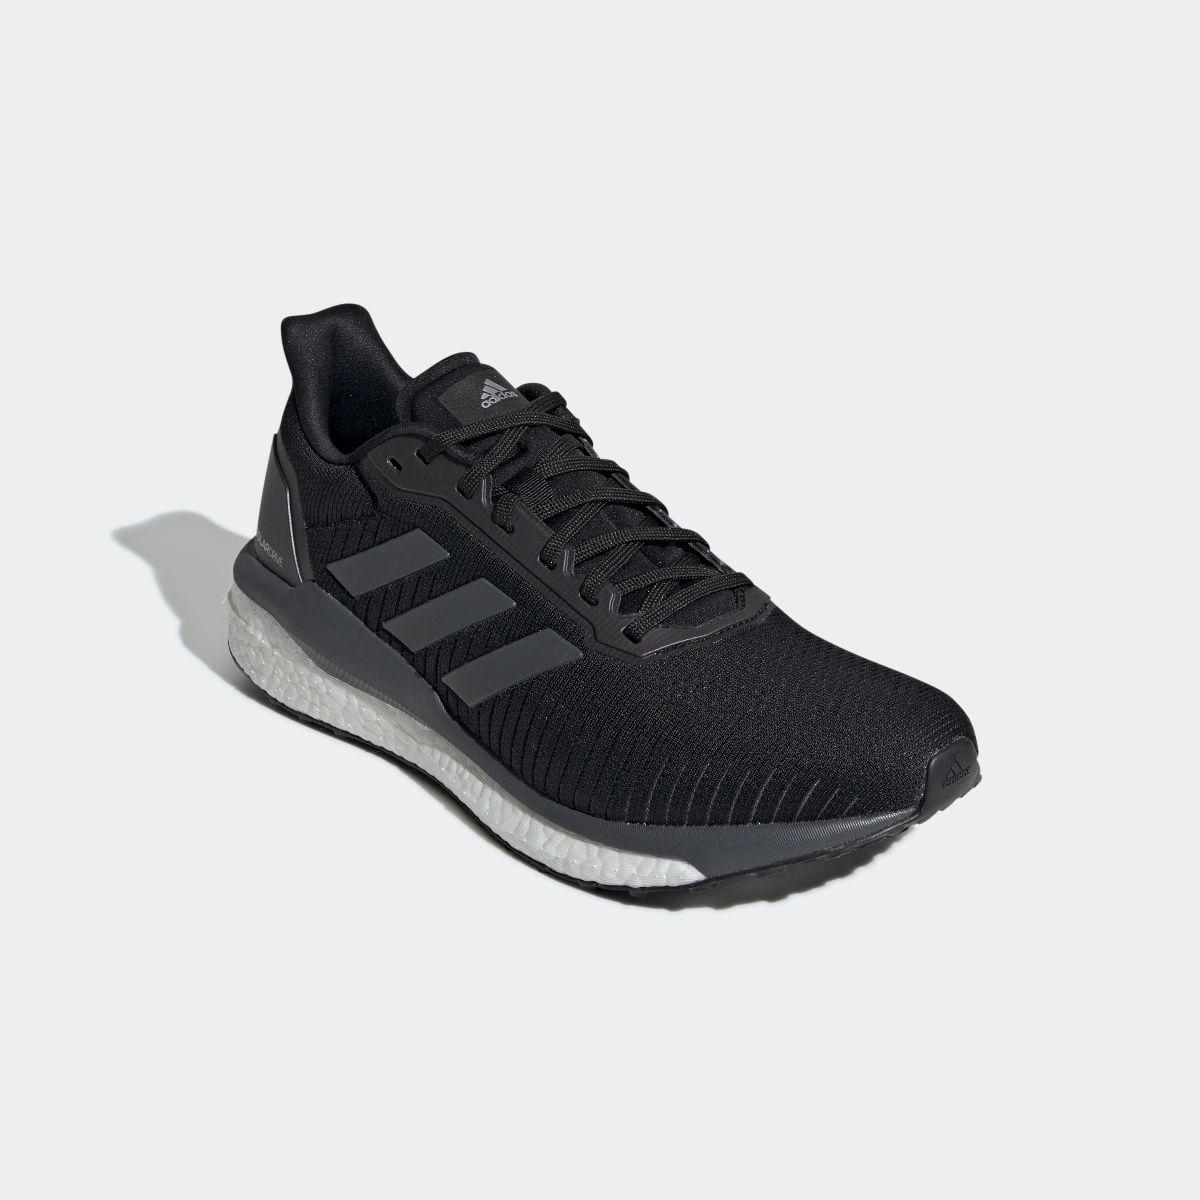 Buty biegowe adidas Solar Drive 19 M EF0789 czarne